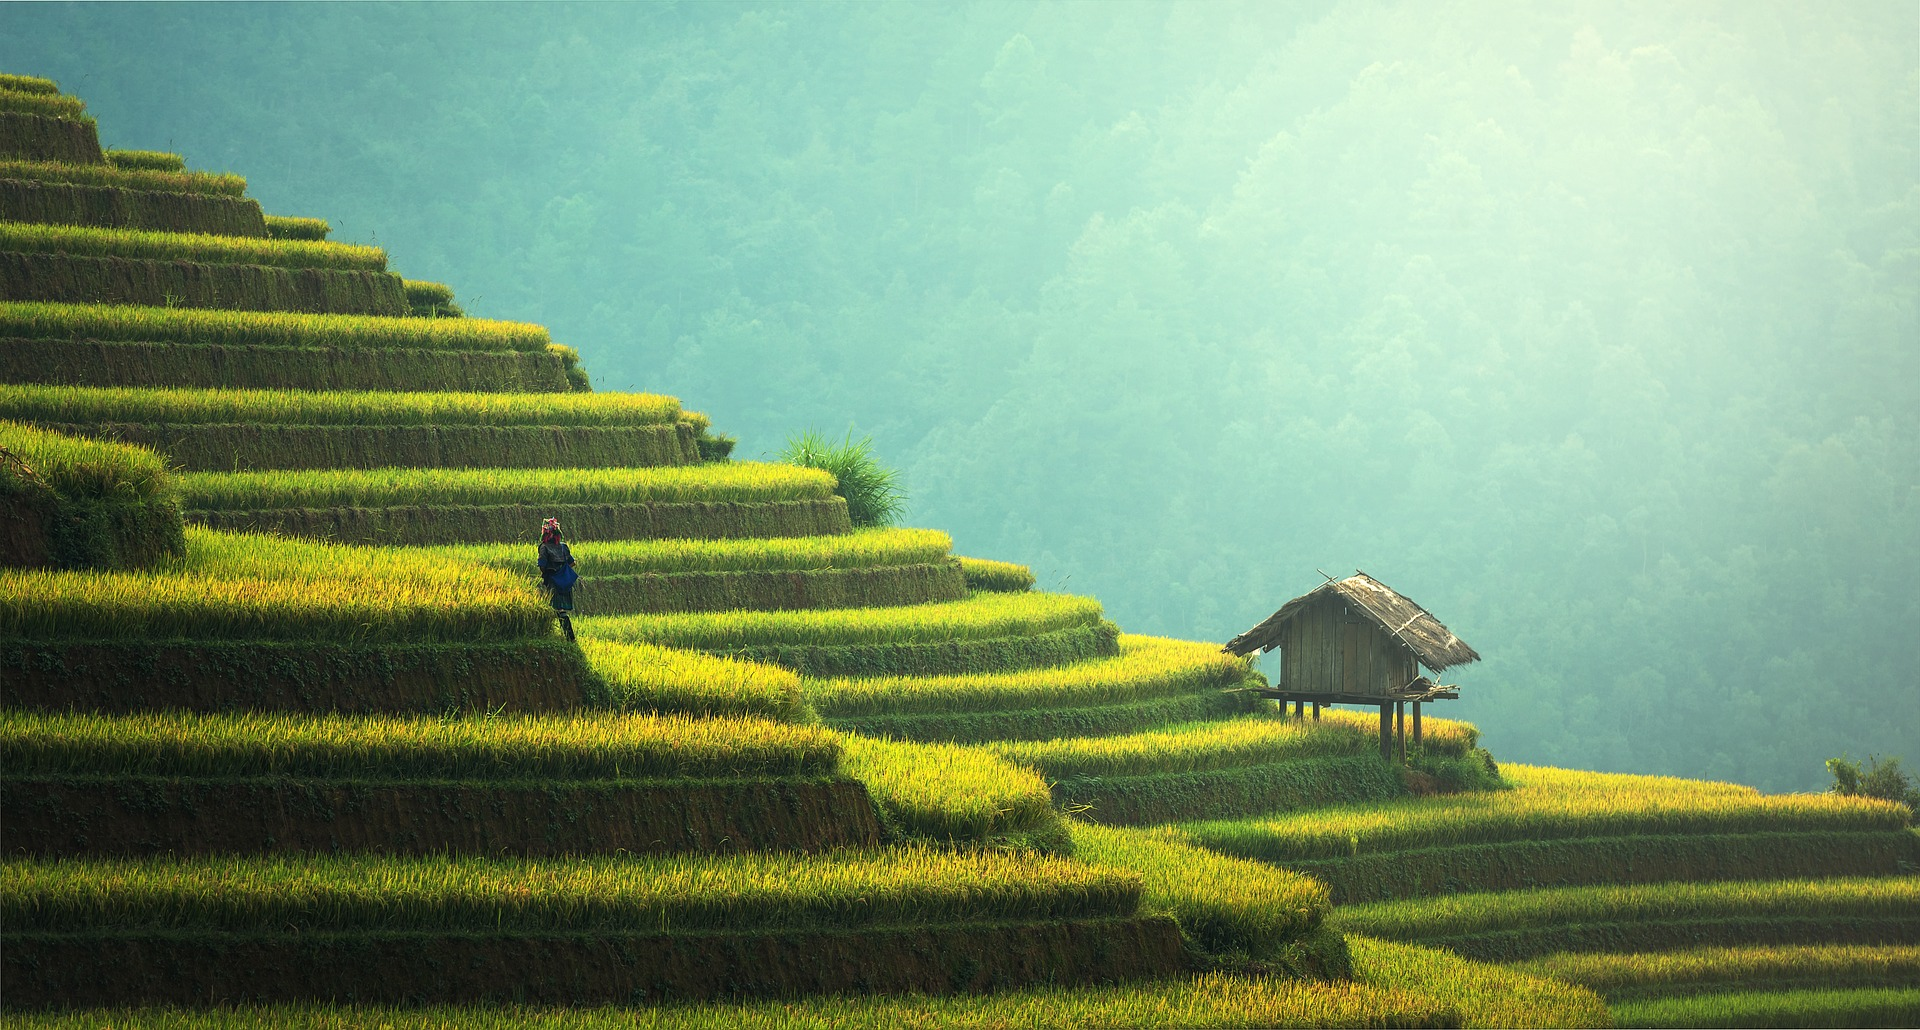 A view of a hillside in Bali